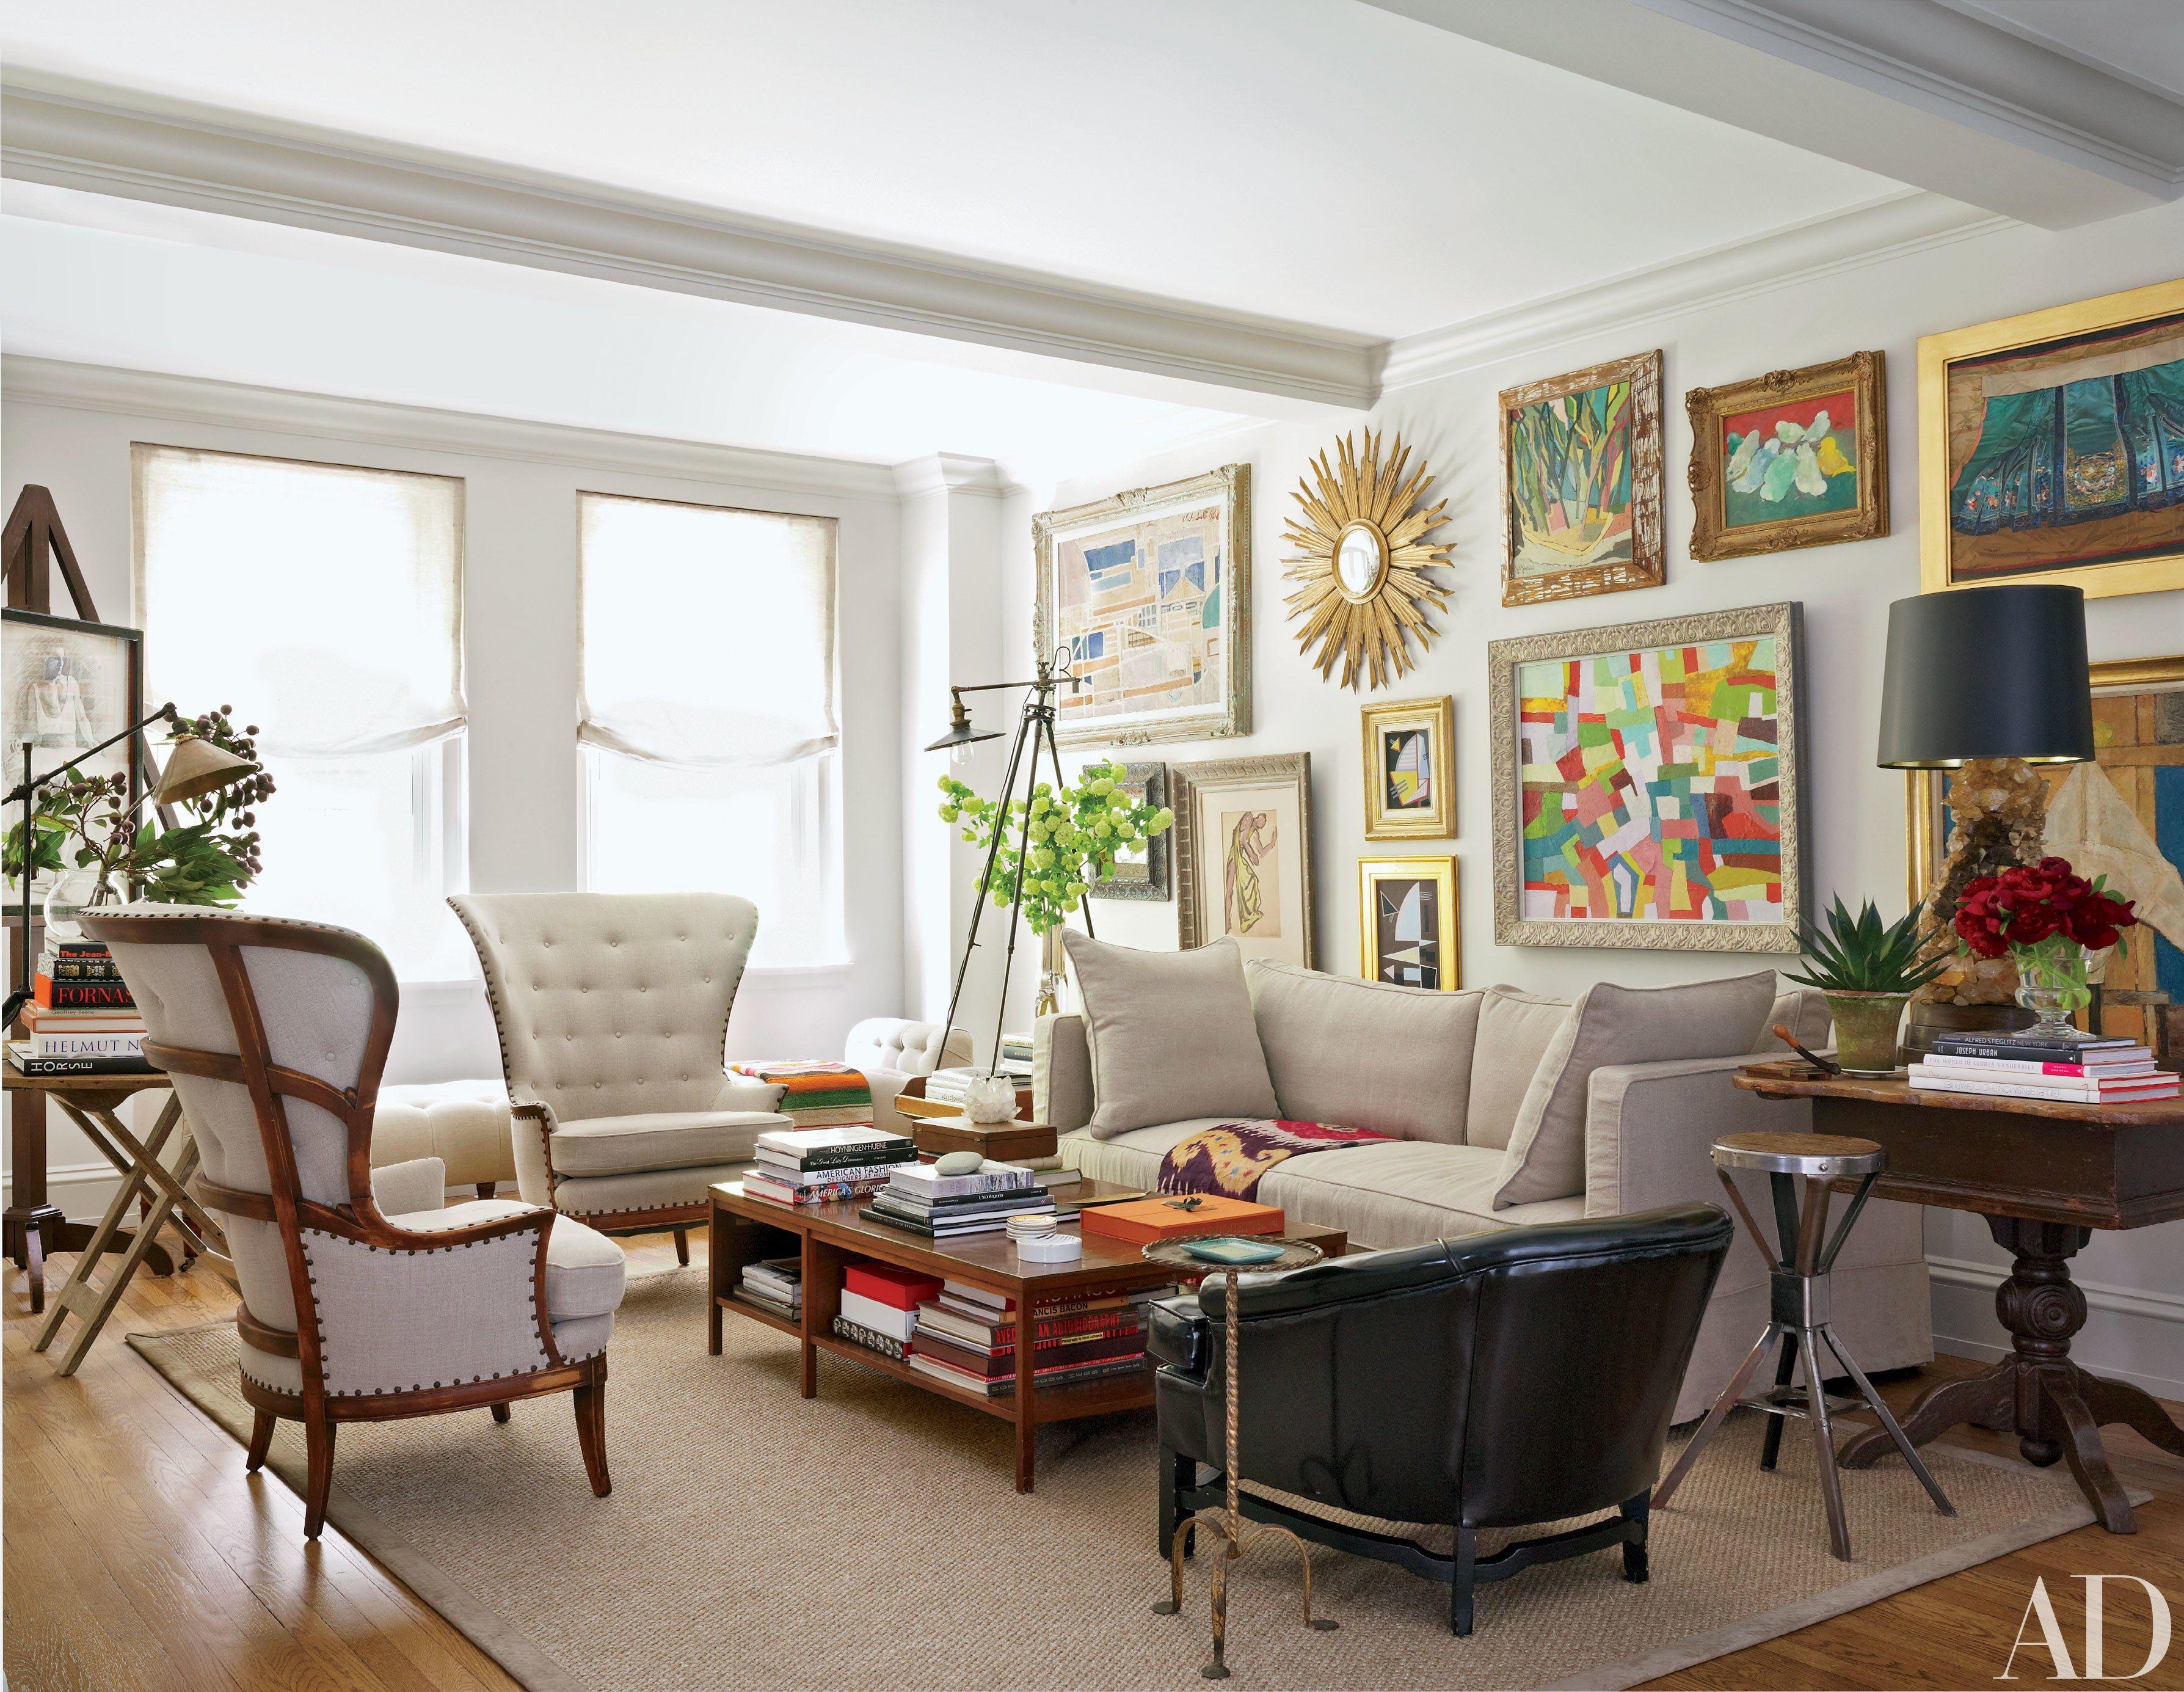 Artworks Get Maximum Impact with Salon-Style Walls | Pinterest ...